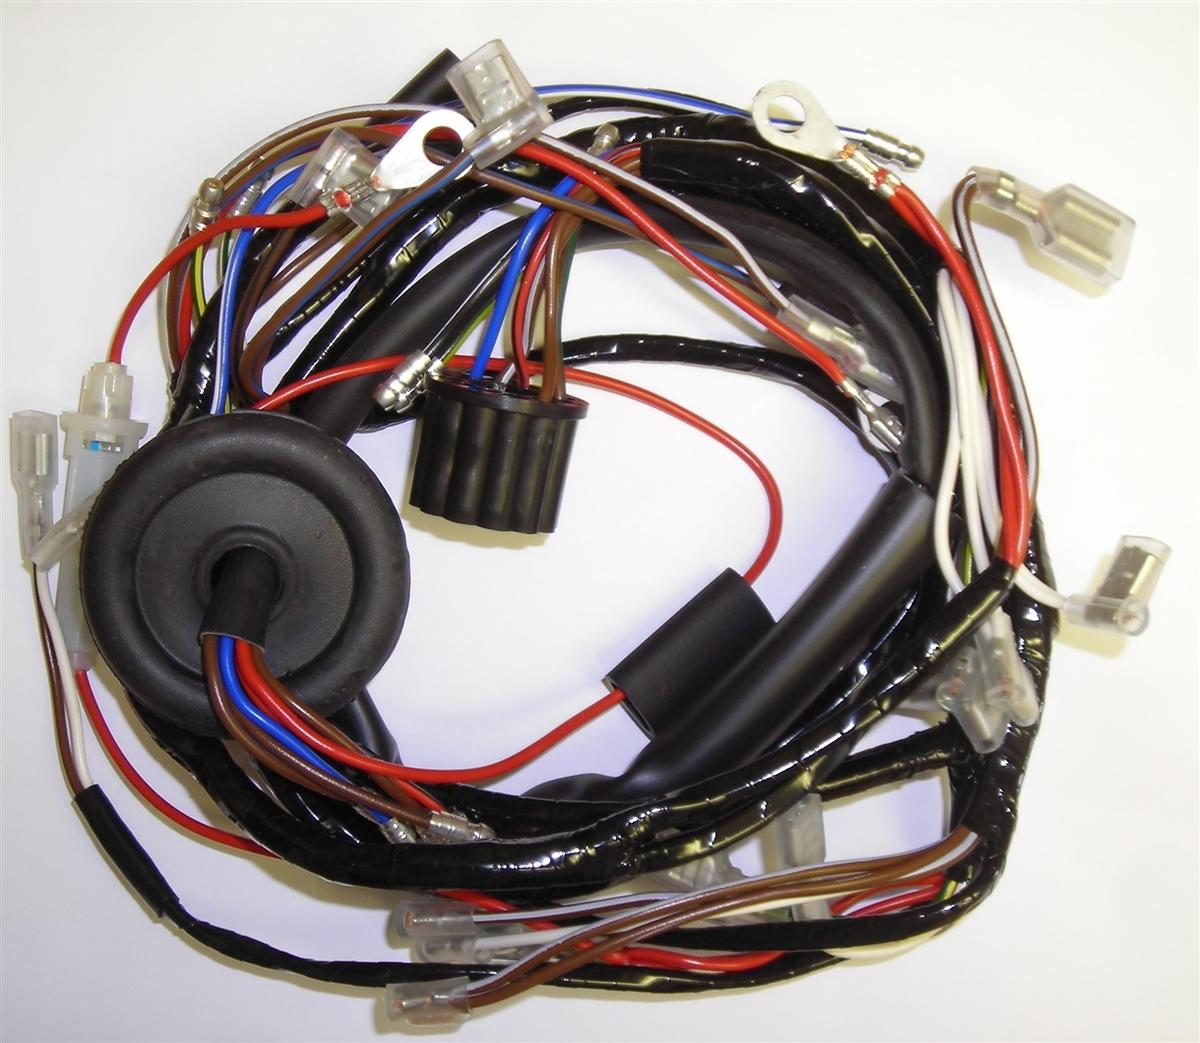 norton 650 mercury \u0026 p11 main harness (mc30pp)  electrical wiring harness norton